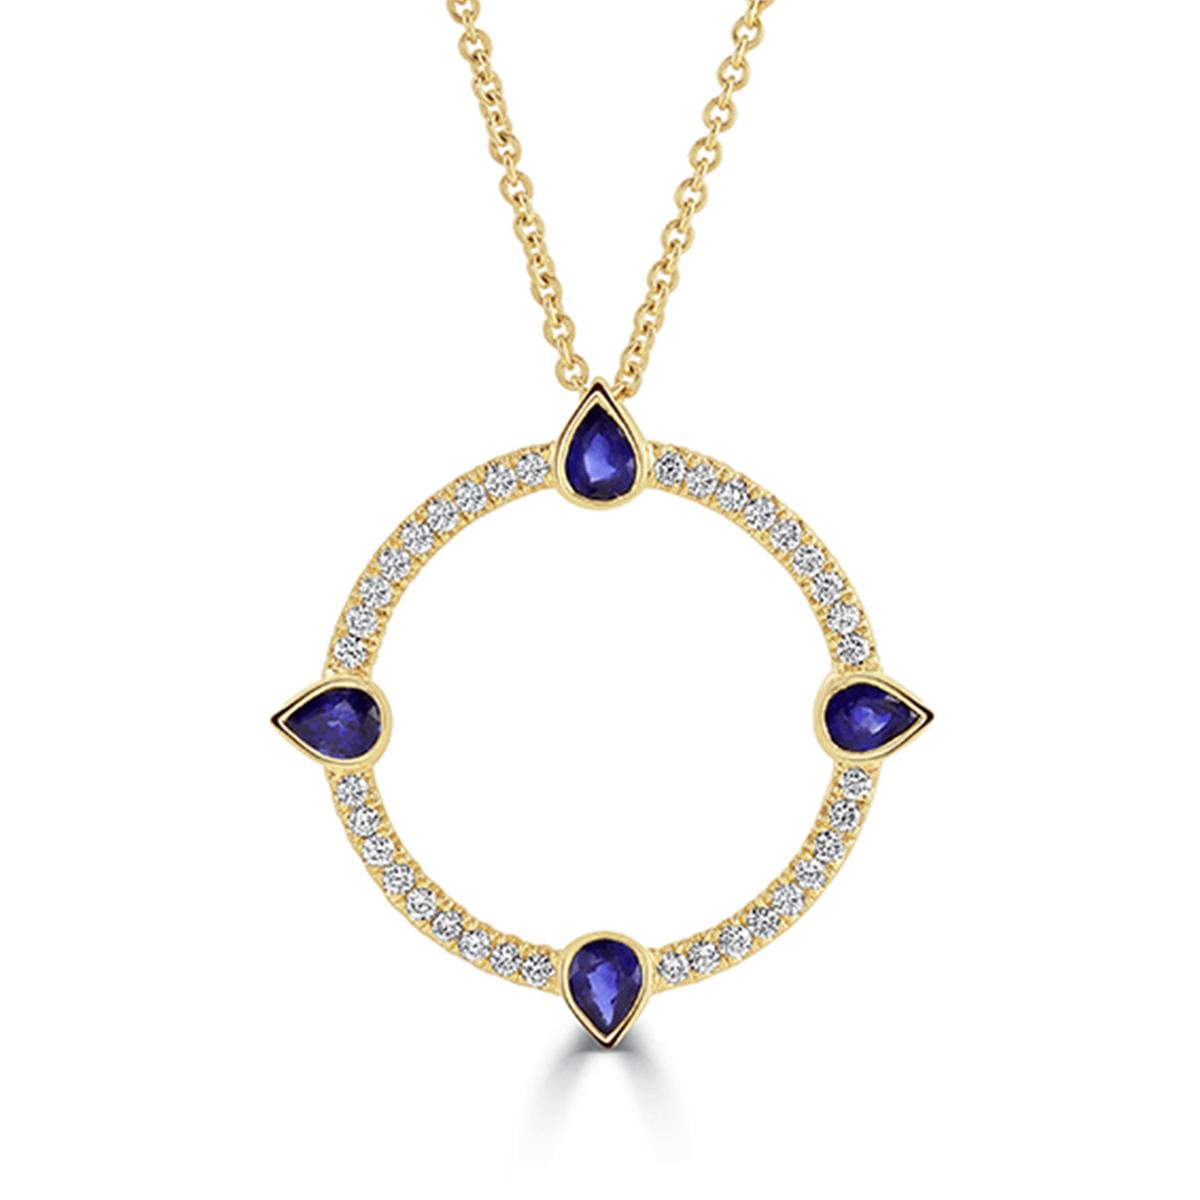 Compass Yellow Gold Large Diamond and Sapphire Pendant